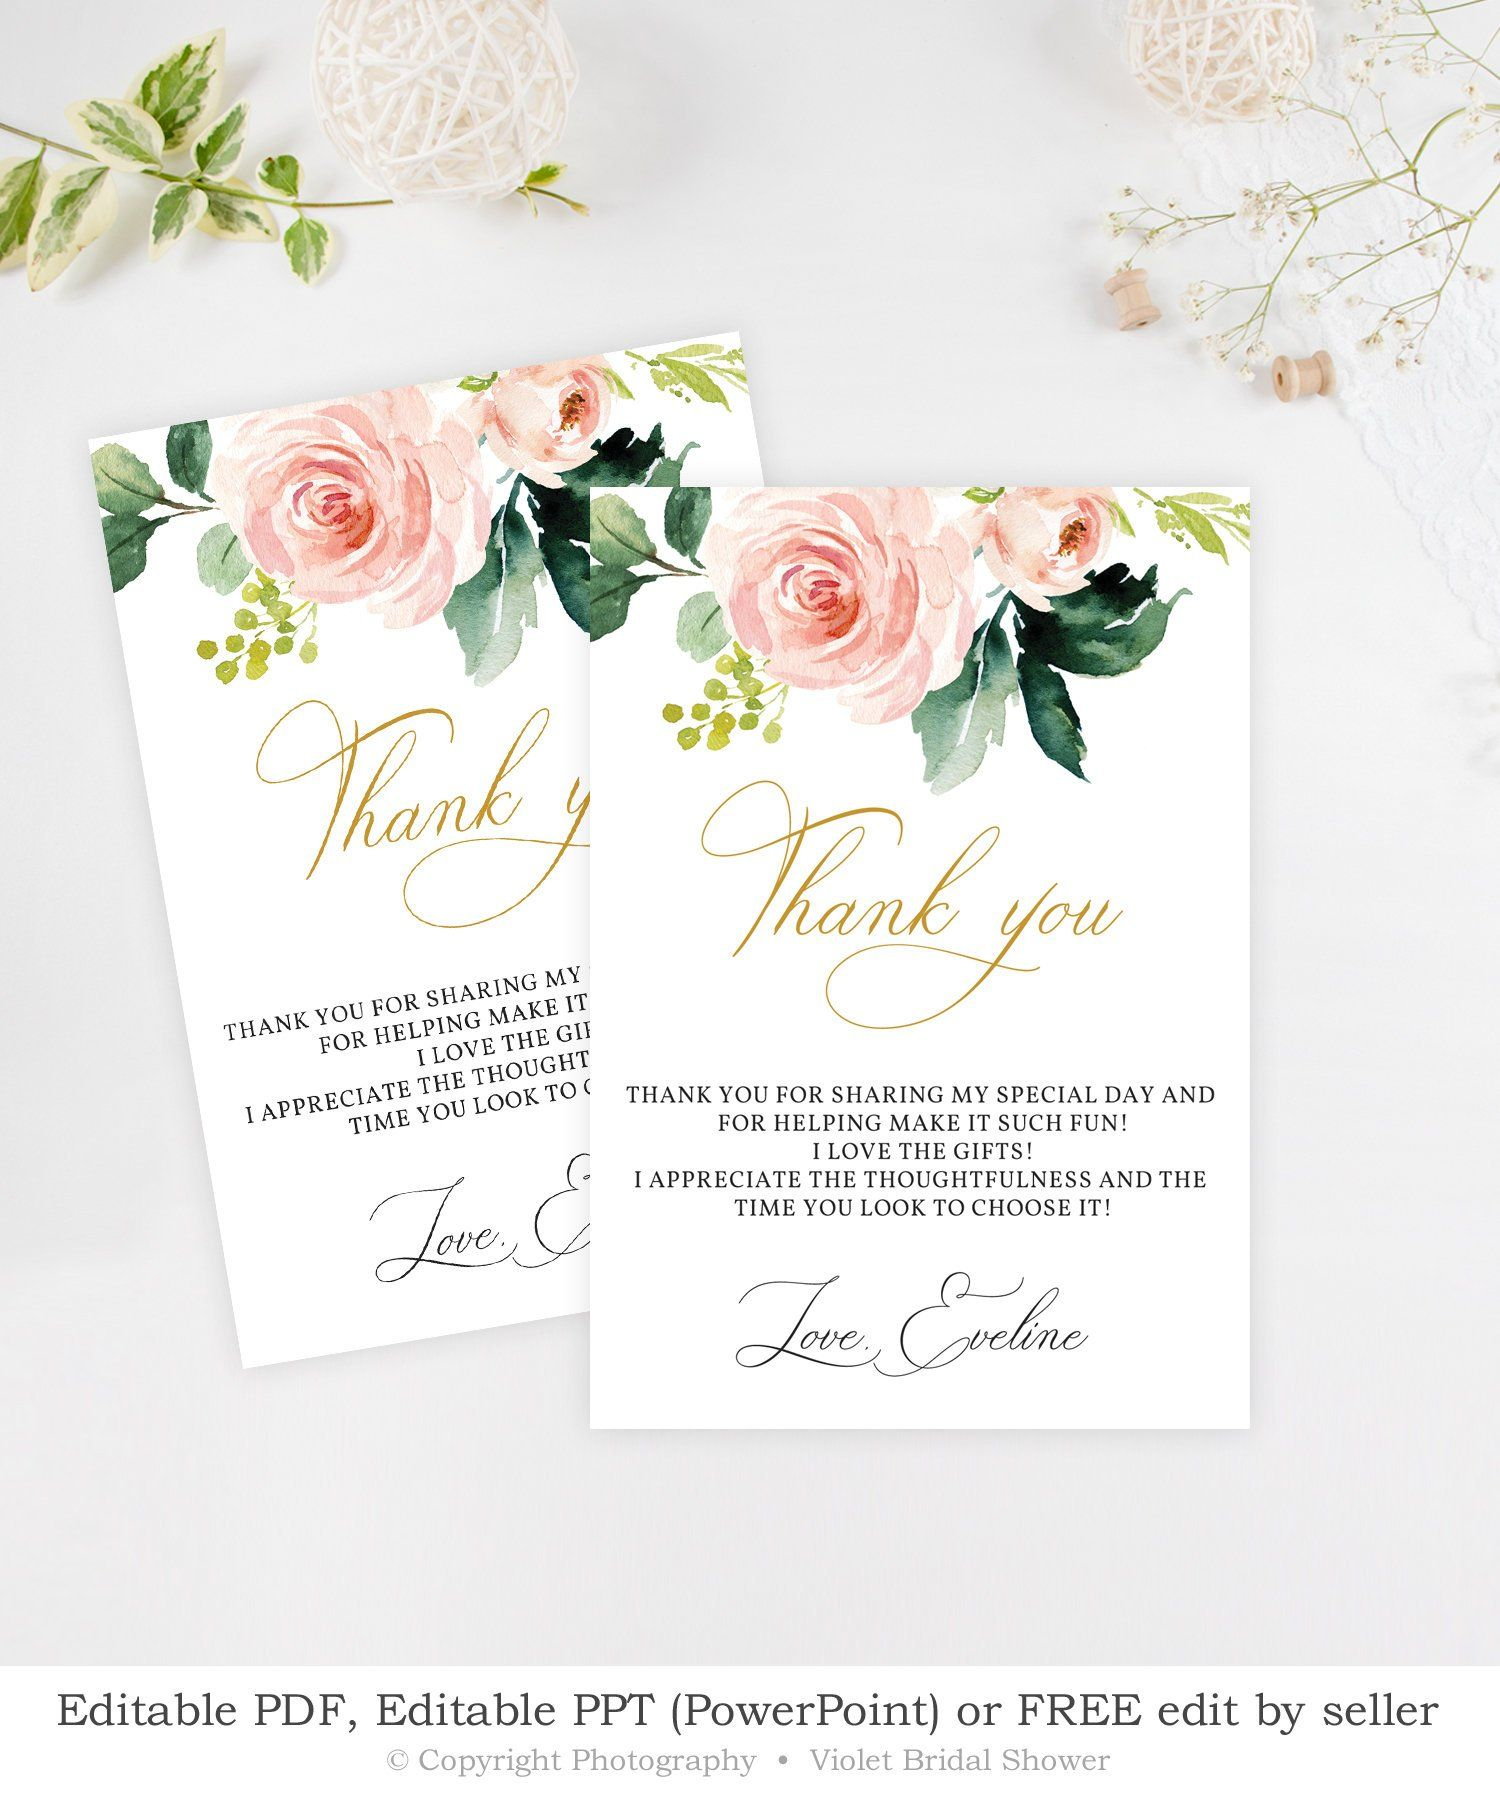 Editable Boho Thank You Card Printable Blush Pink Floral Bridal Shower Thank You Pink Go Boho Bridal Shower Thank You Card Template Bridal Shower Printables